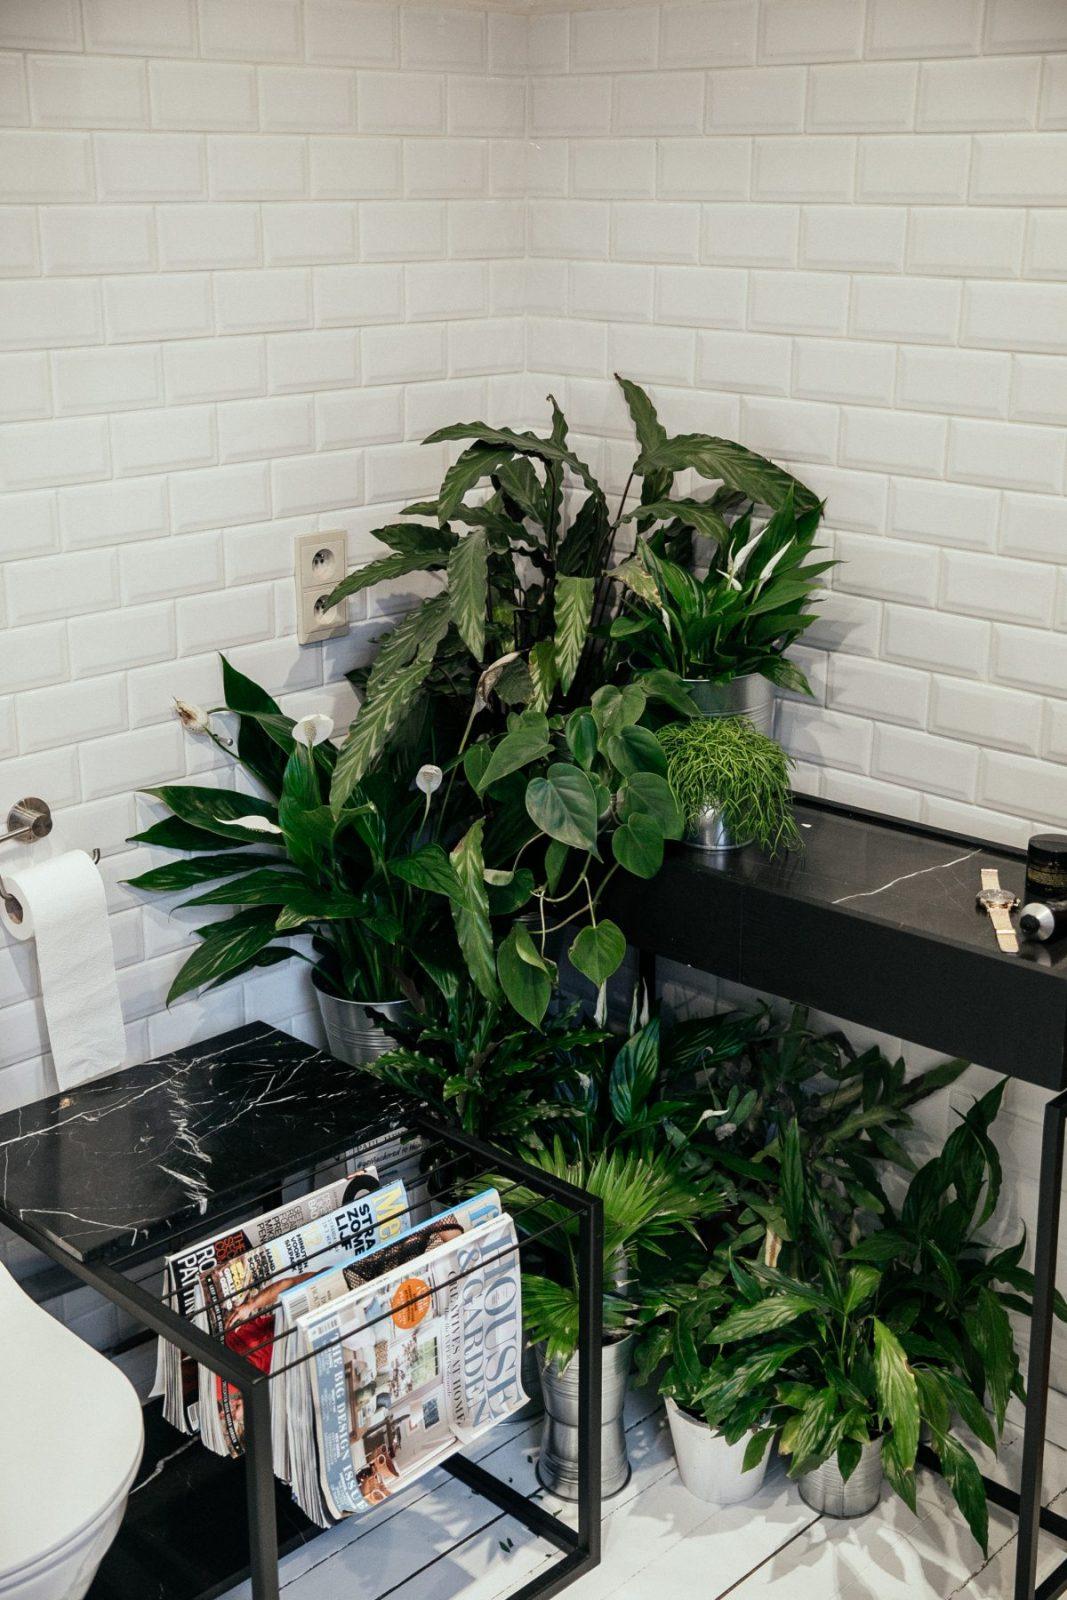 Superieur Tags: Bathroom, DIALECT, Hang It, Jungle Bathroom, JUNO, Plants In Bathroom,  Serax, White Bathroom